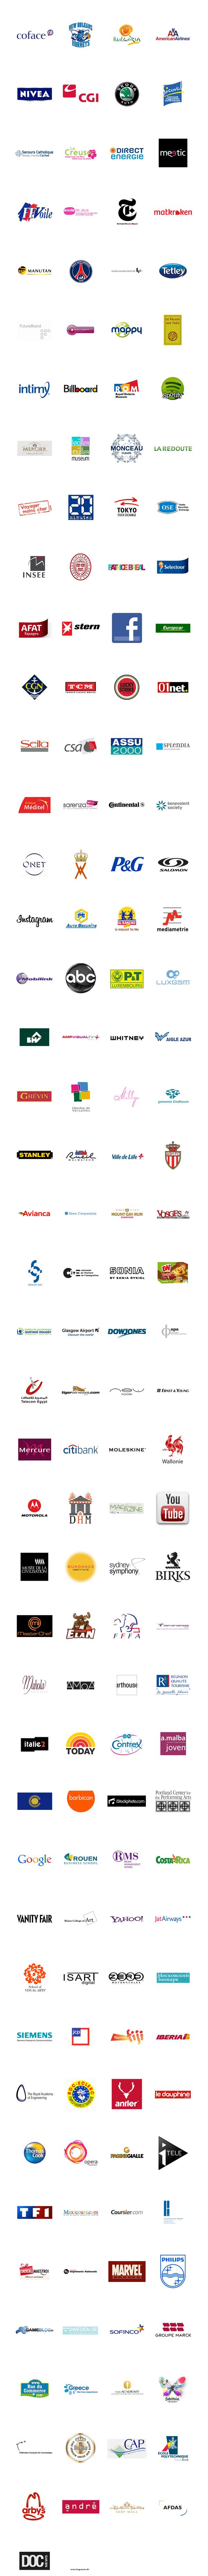 Cimetière_Logos_2013_LOGONEWS